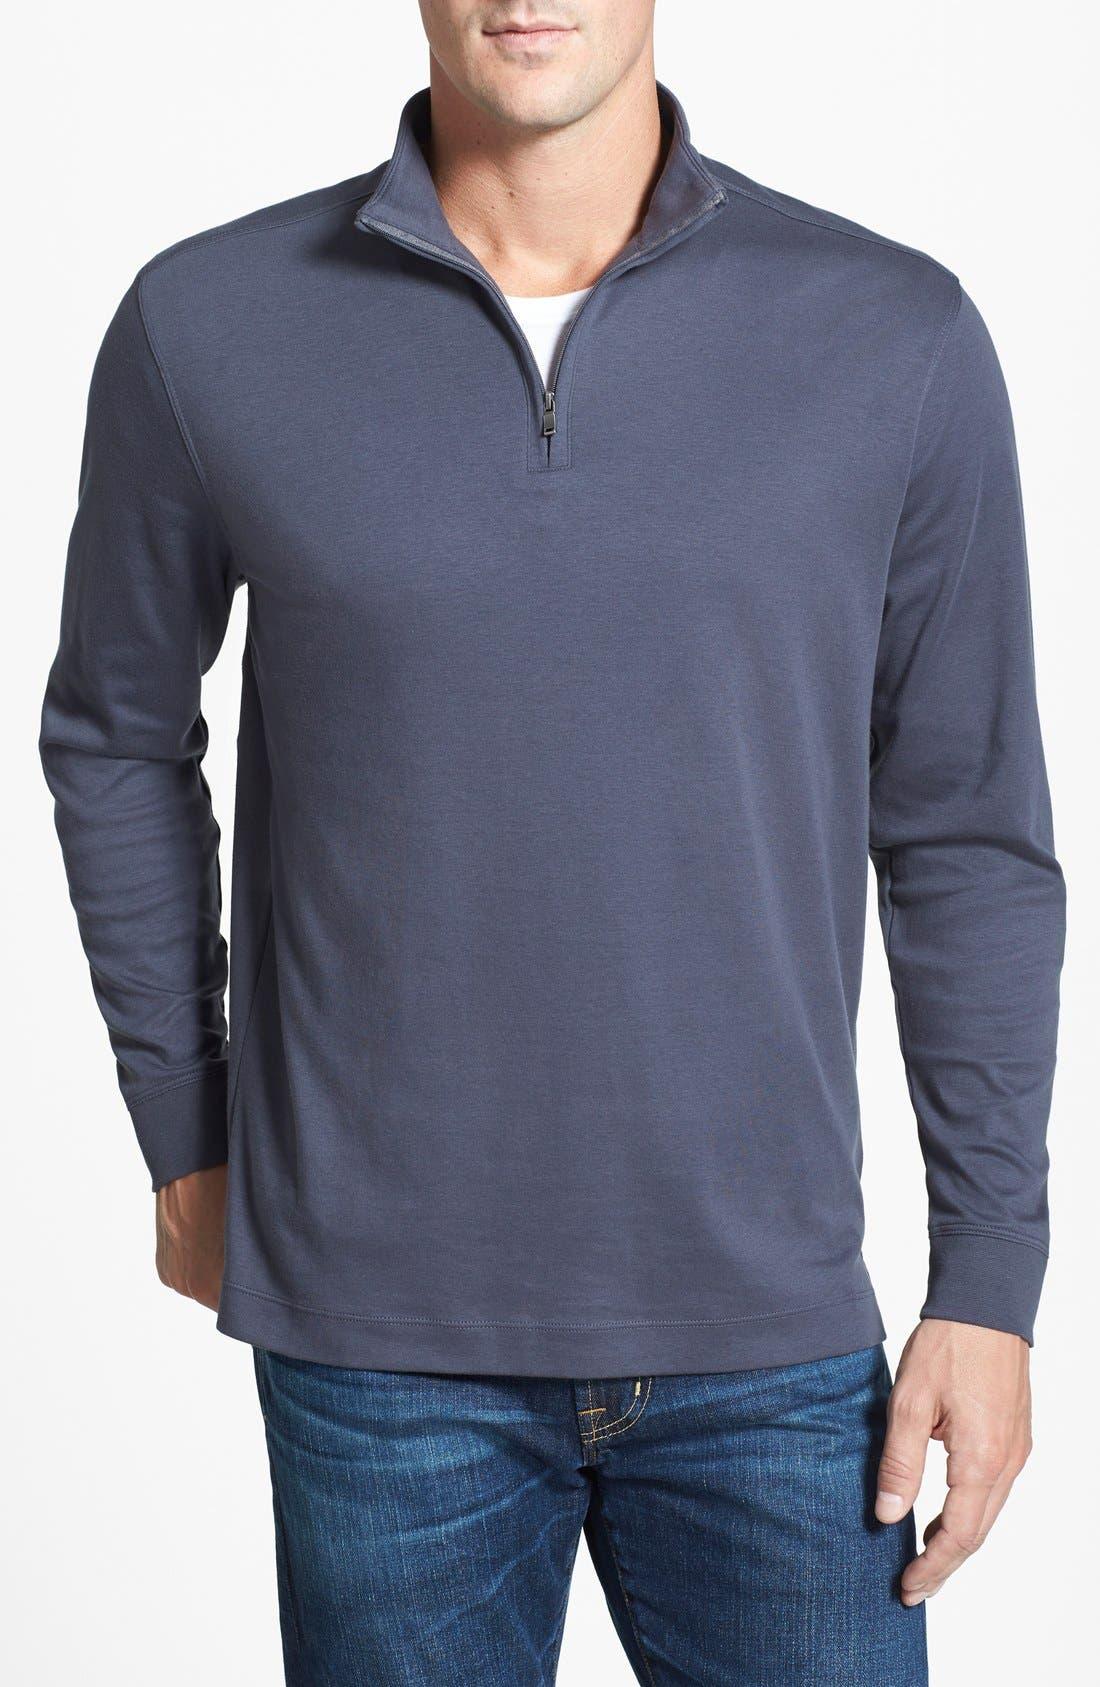 Belfair Quarter Zip Pullover,                         Main,                         color, Onyx Grey